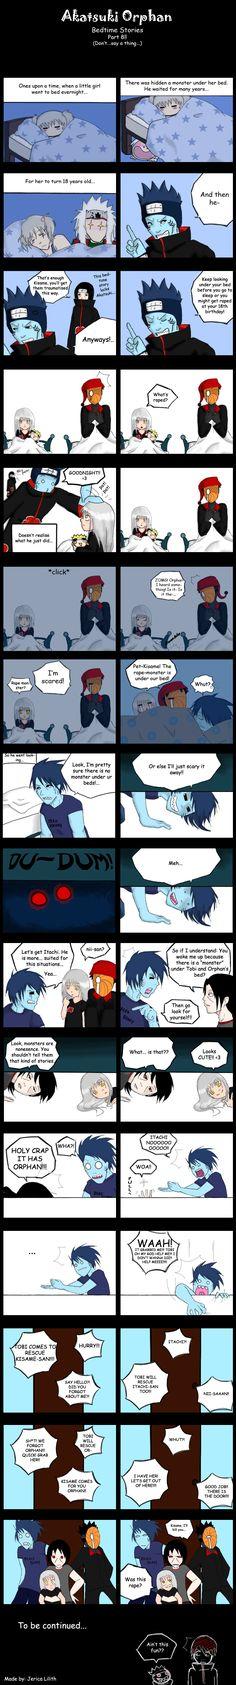 Akatsuki Orphan - Comic 8 by JericaLilith.deviantart.com on @DeviantArt